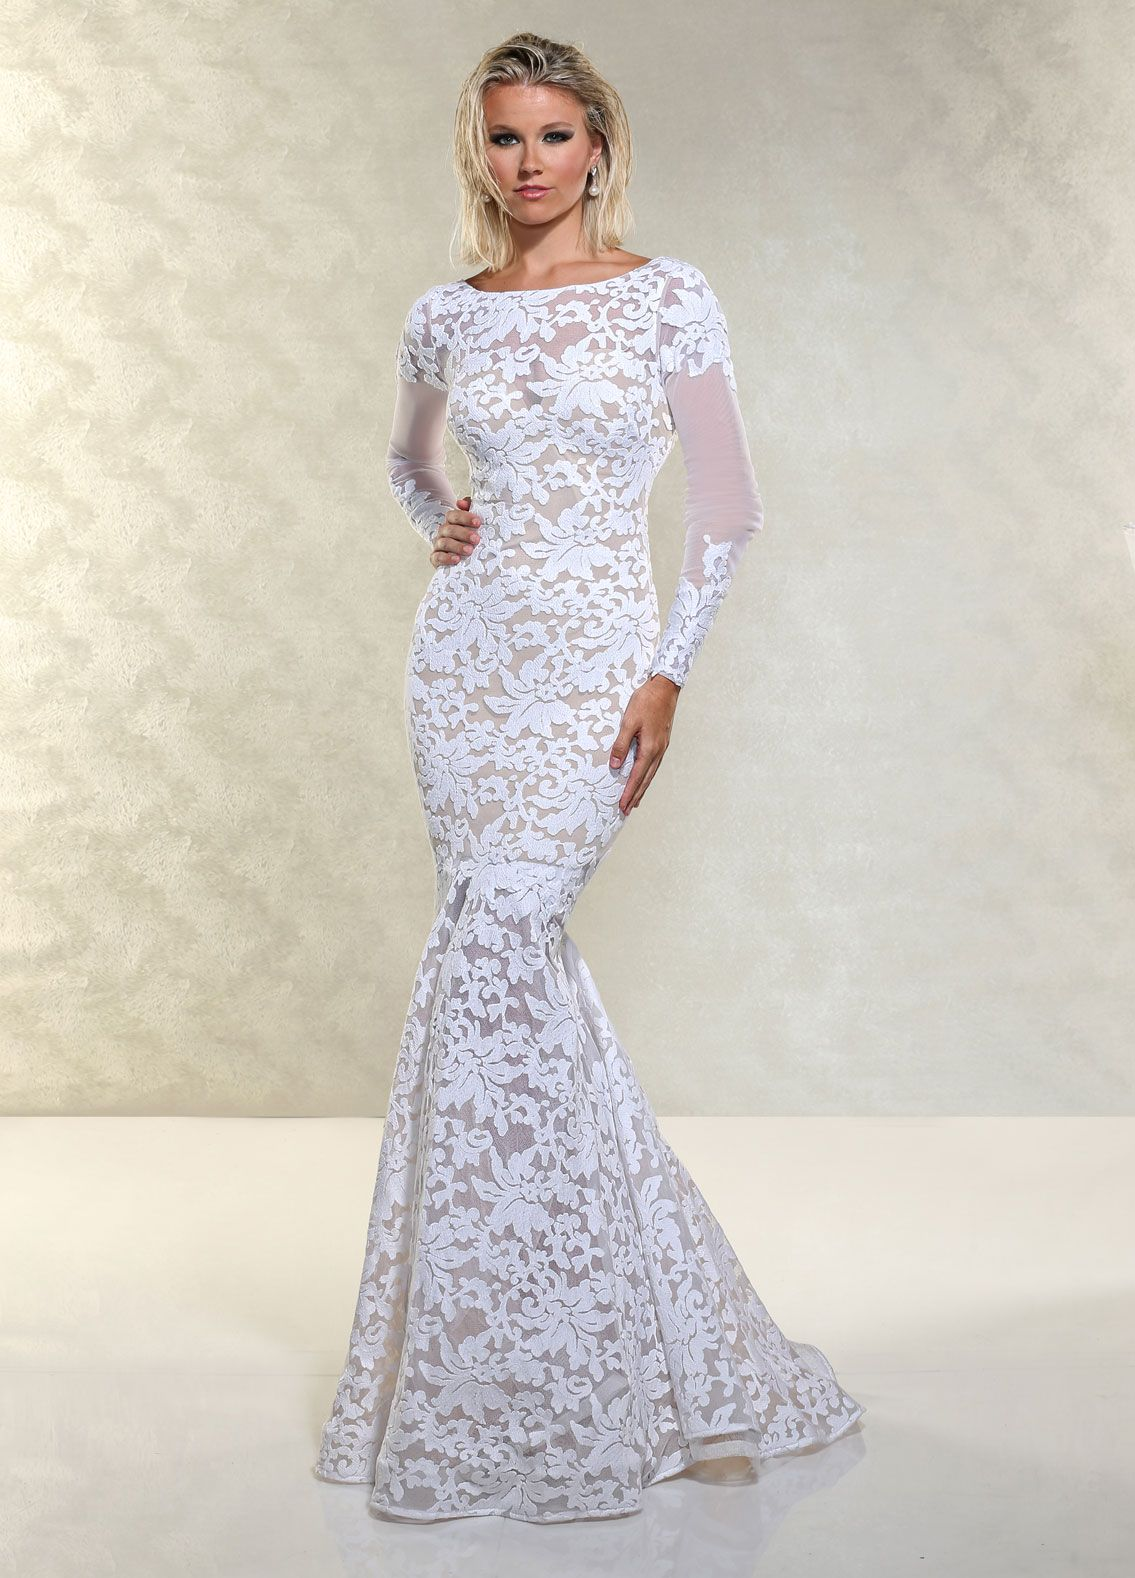 White dress by xtreme prom white dresses pinterest prom